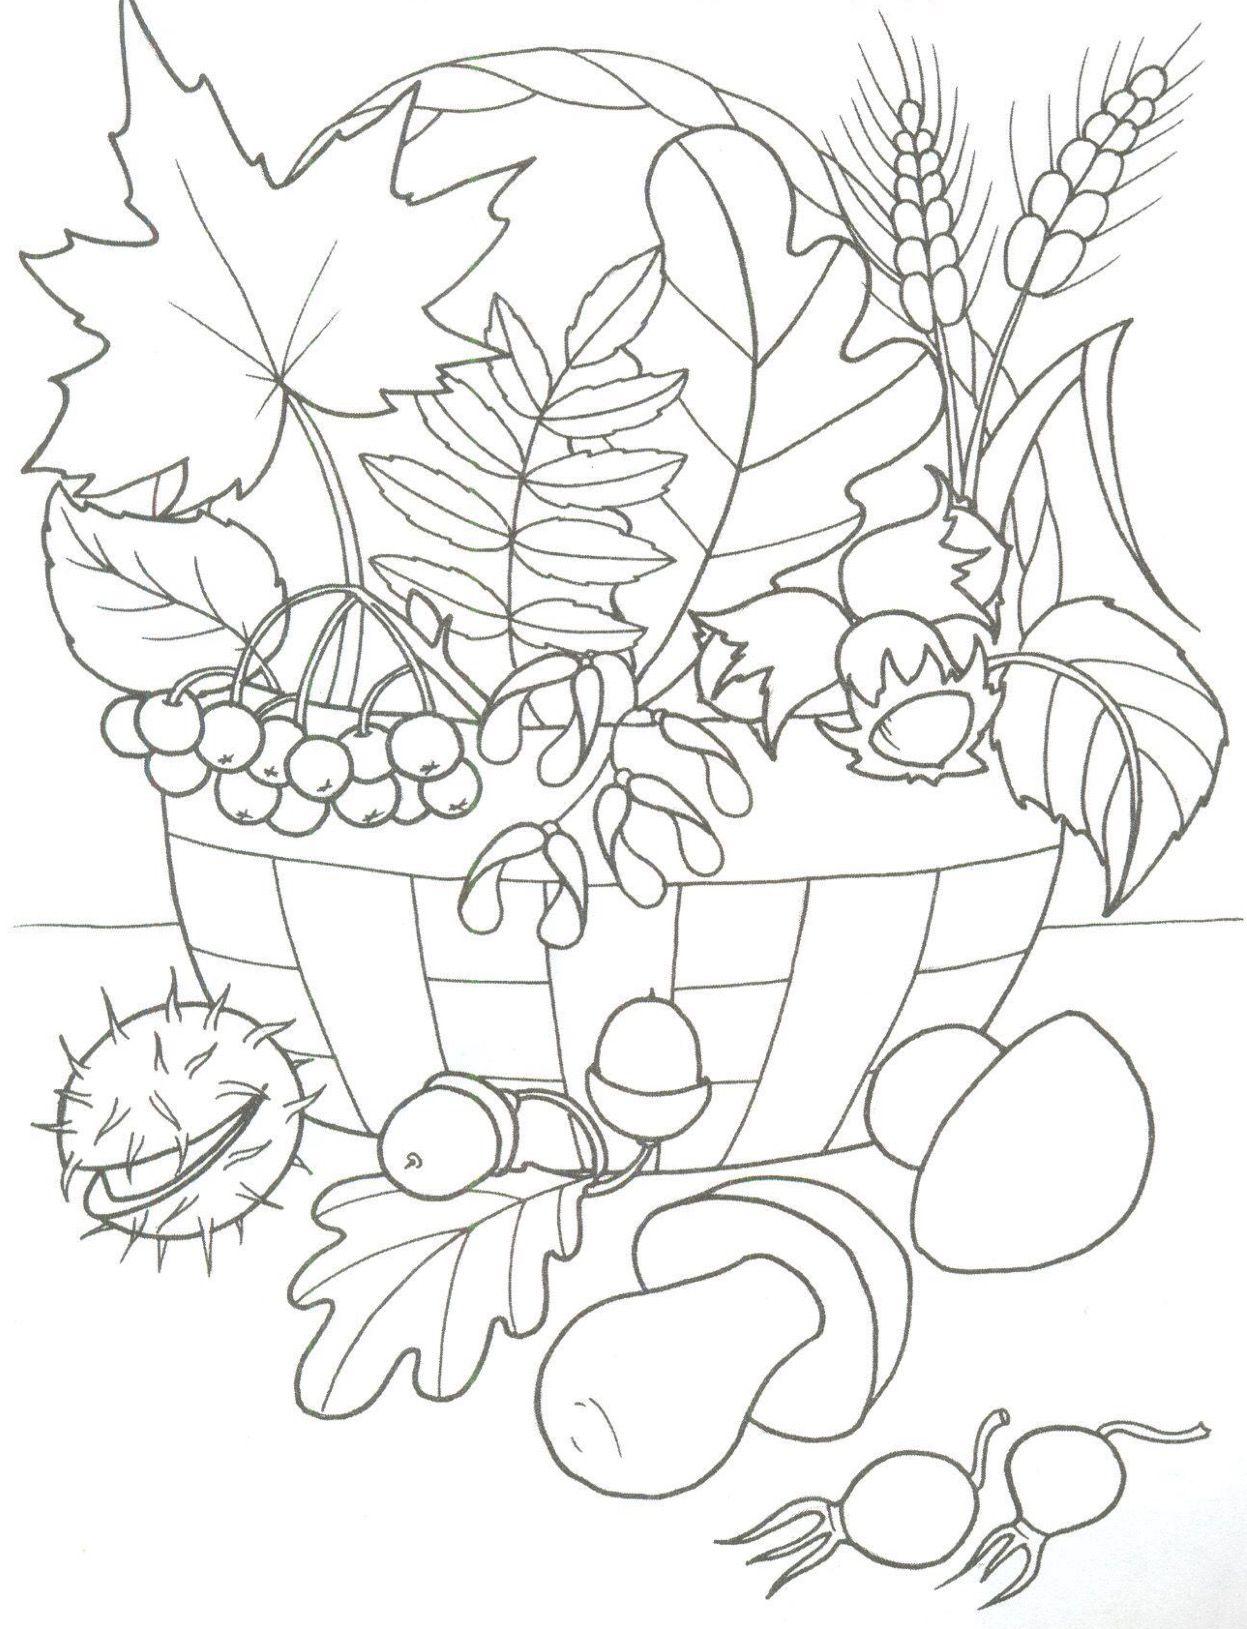 Pin de Kovács Judit en ősz | Pinterest | Dibujo